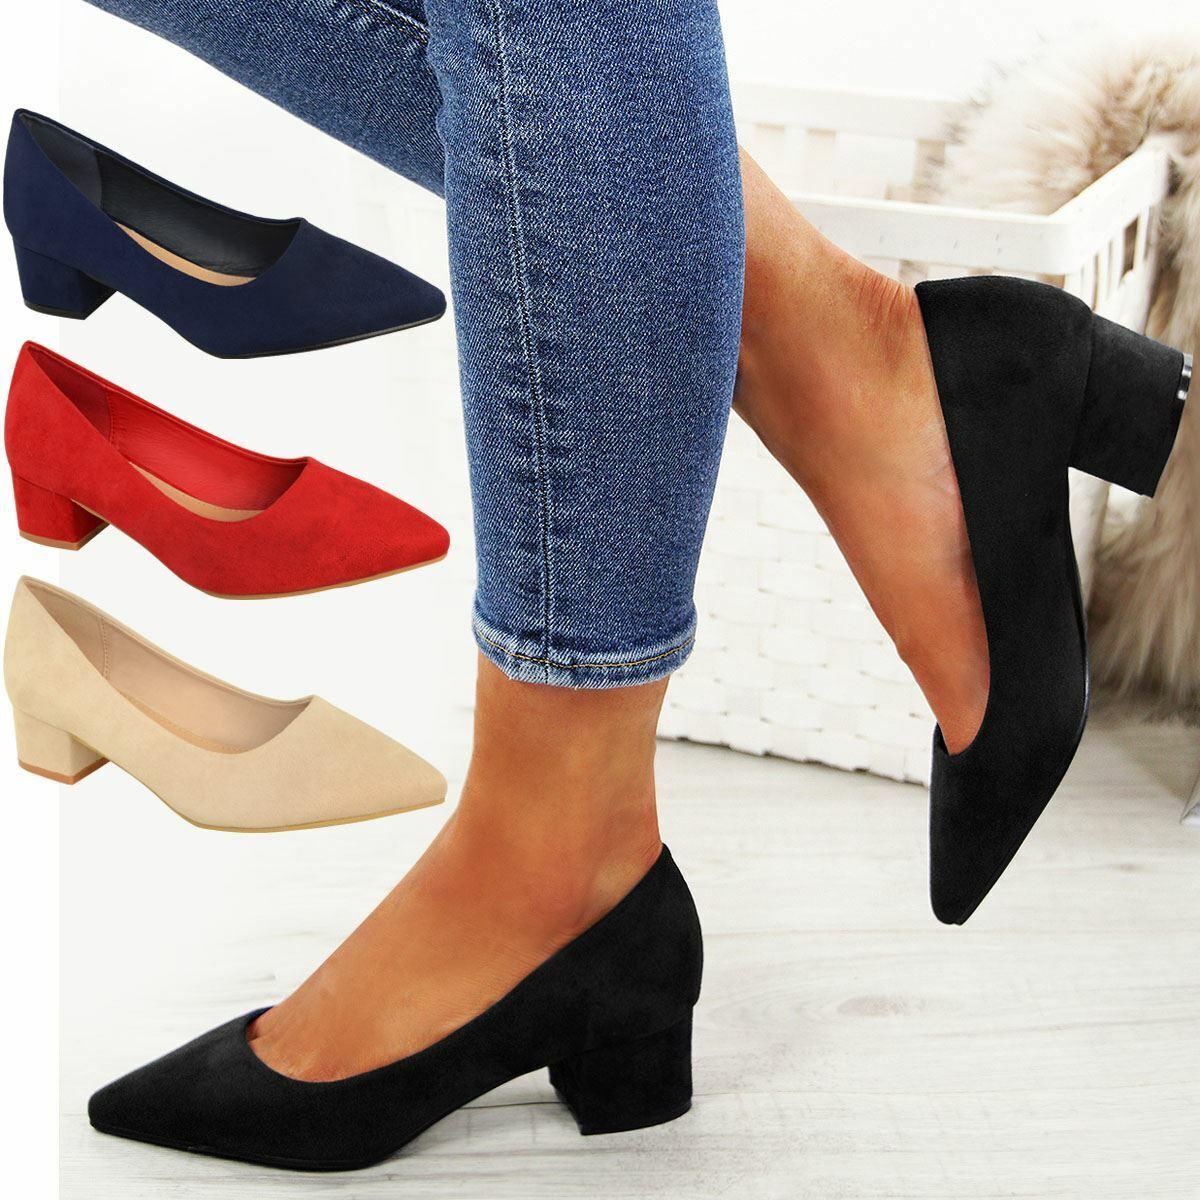 Tamaris 22306 Black Leather Low Heel